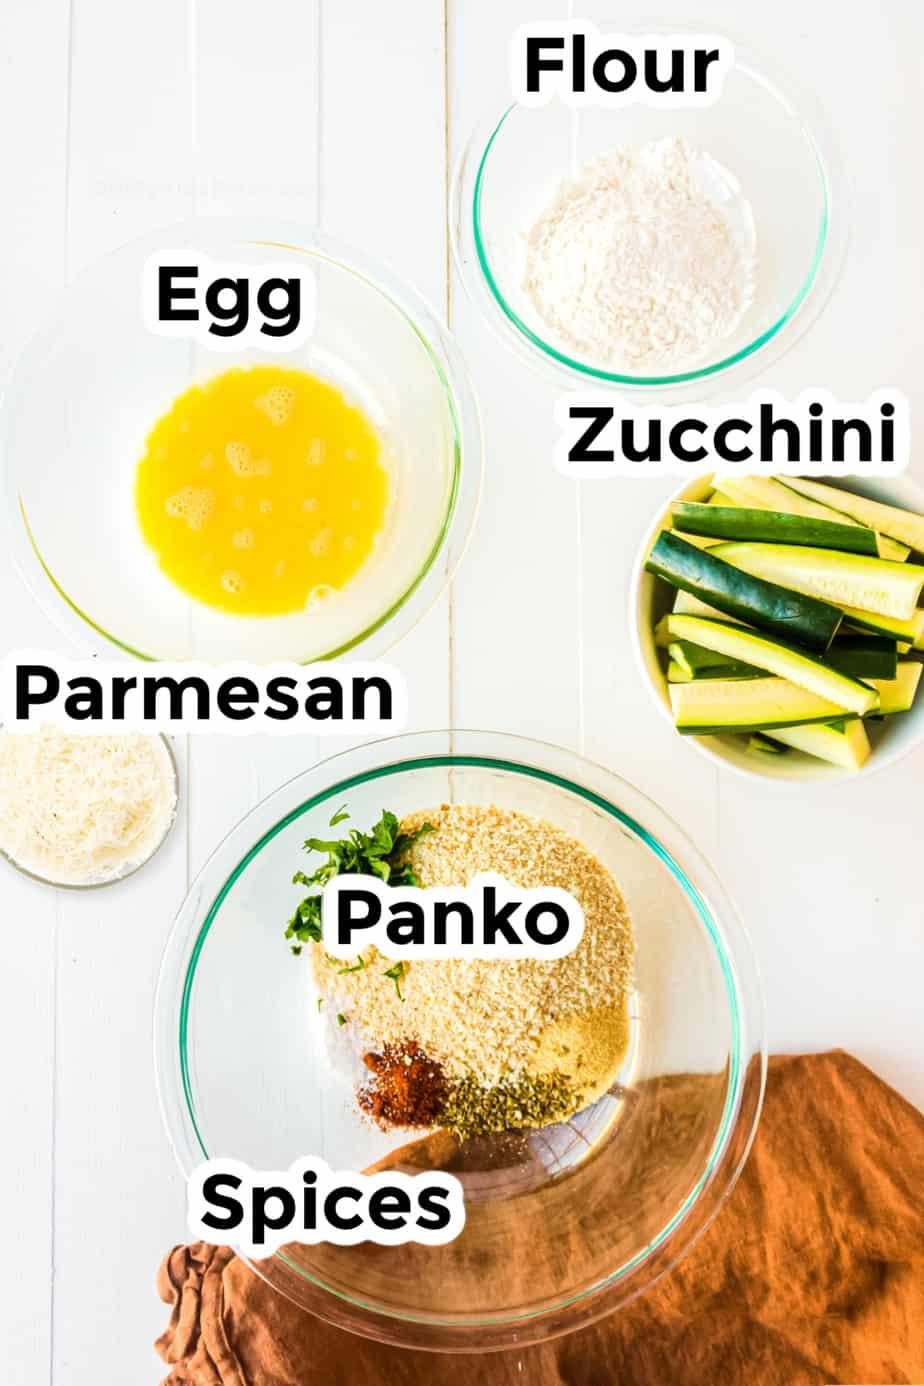 Ingredients in bowls for Parmesan Garlic Zucchini Fries